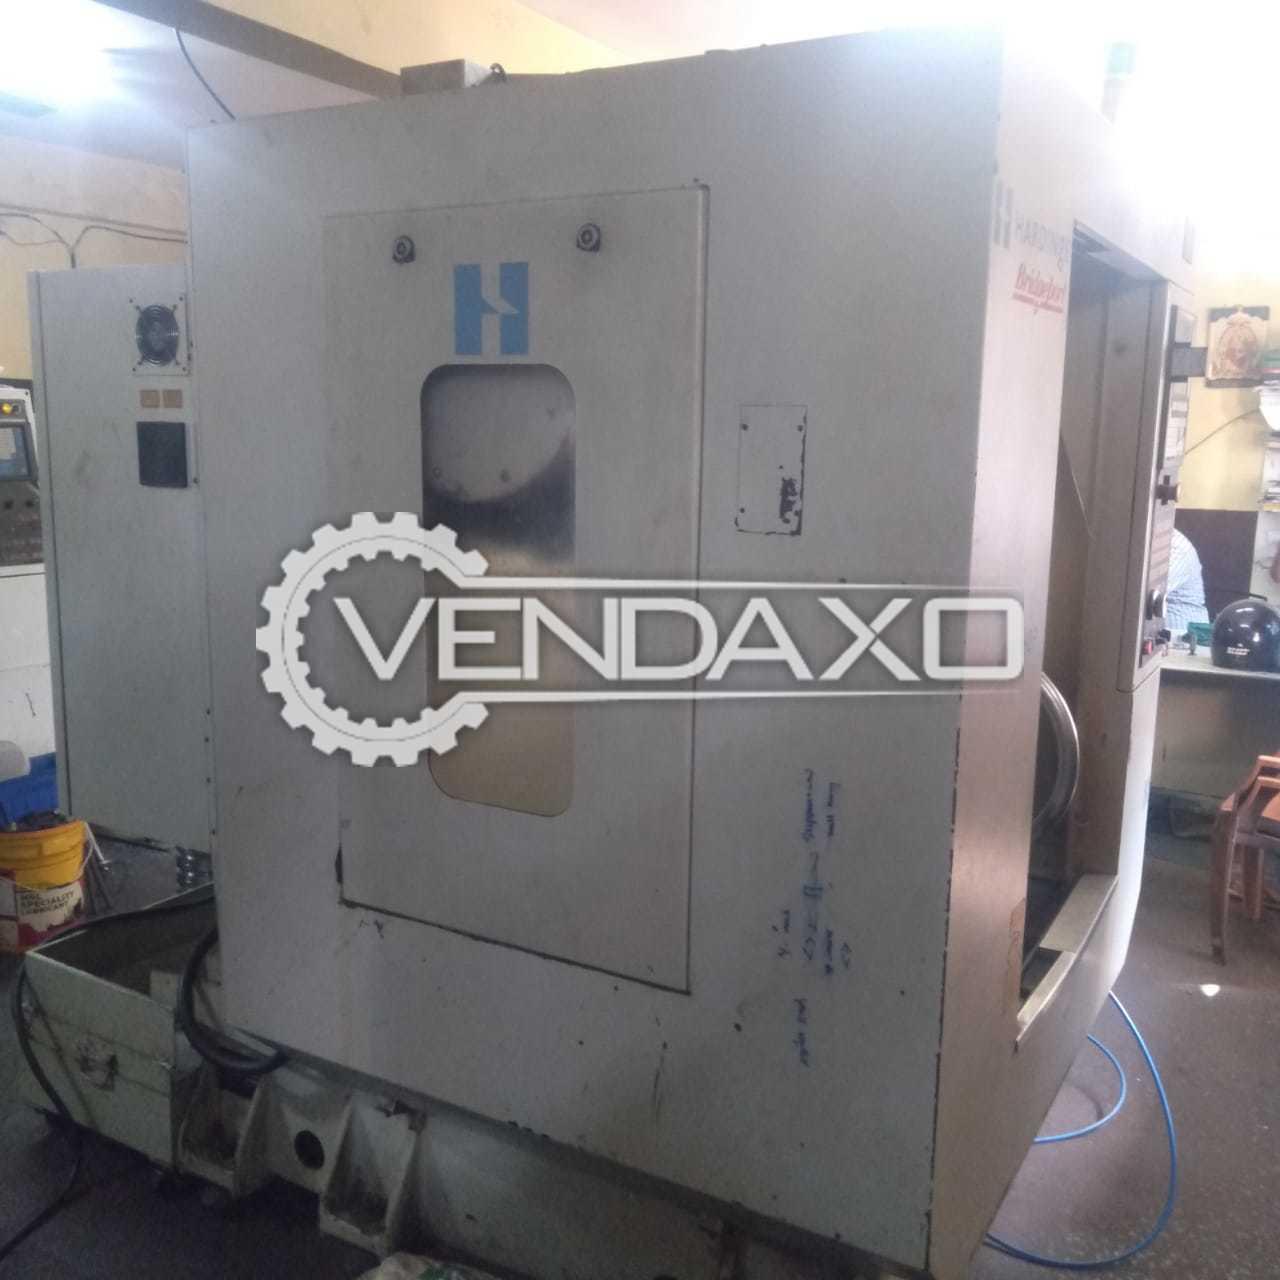 Hardinge CNC Vertical Machining Center VMC - Table Size - 600 x 400 mm